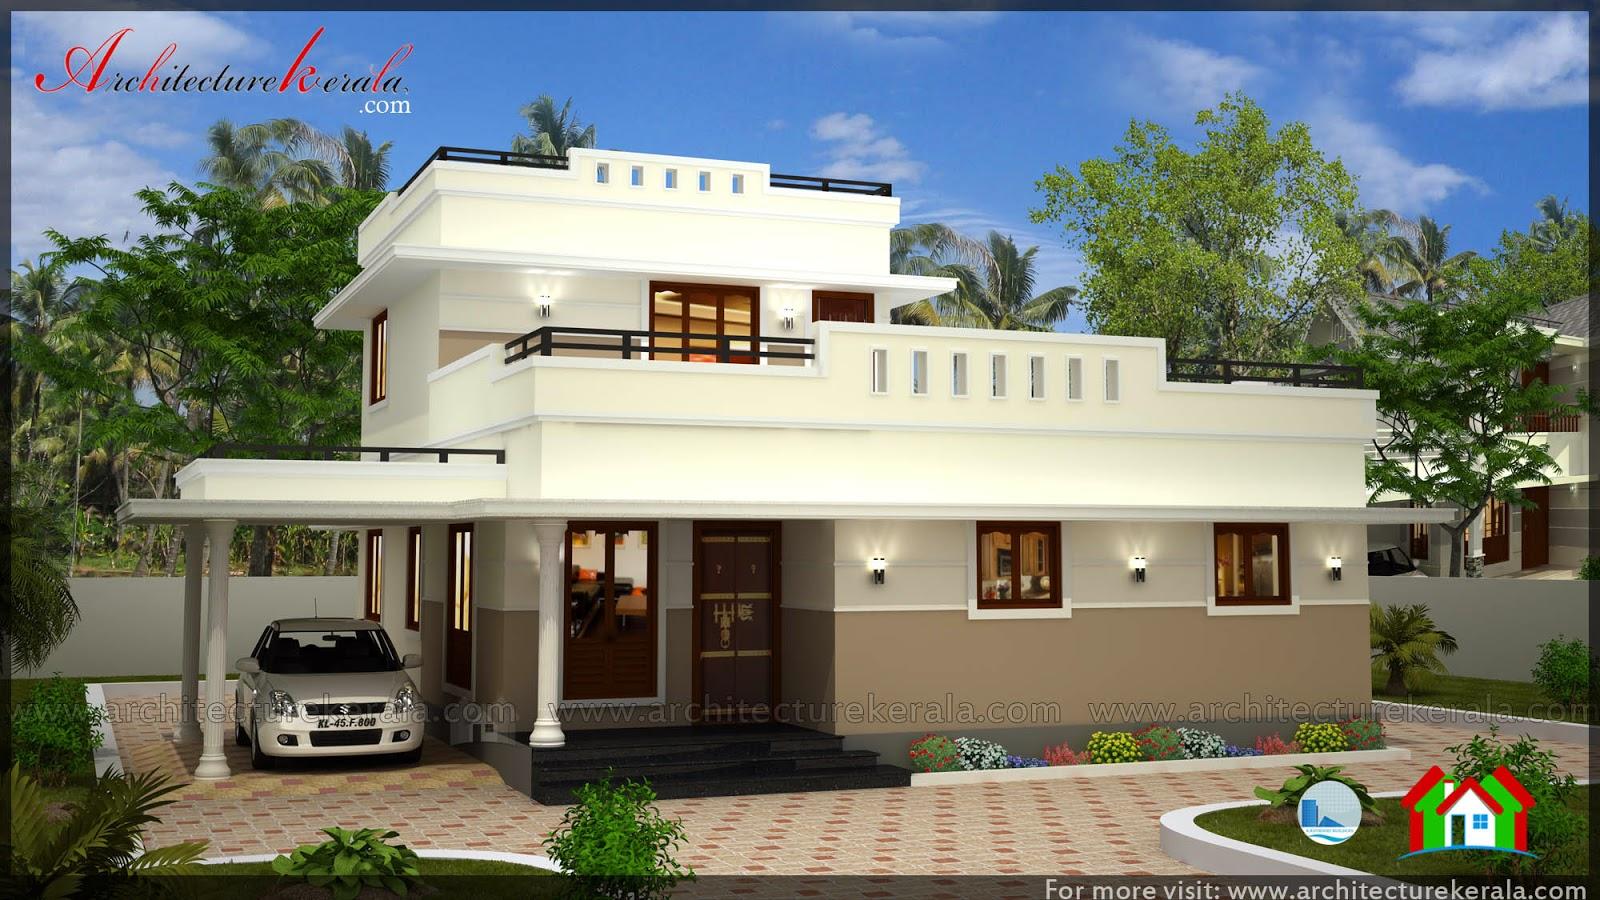 Kerala Nalukettu Home Plan Indian House Plans | Trend Home Design And ...